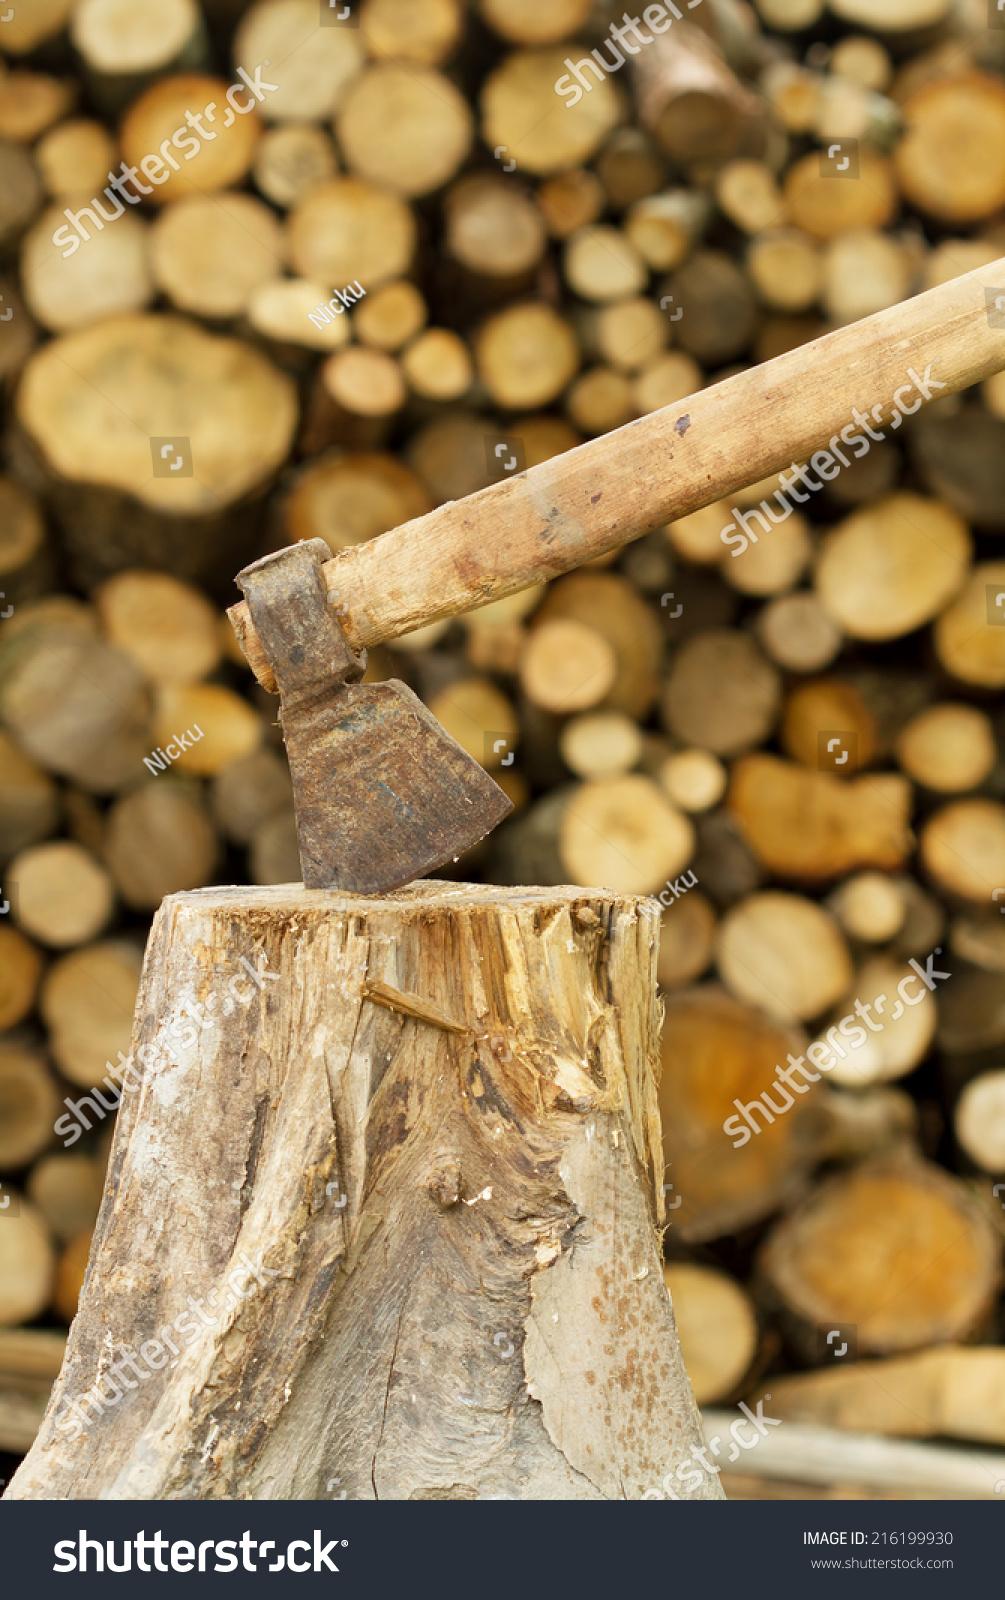 Firewood axe stock photo shutterstock